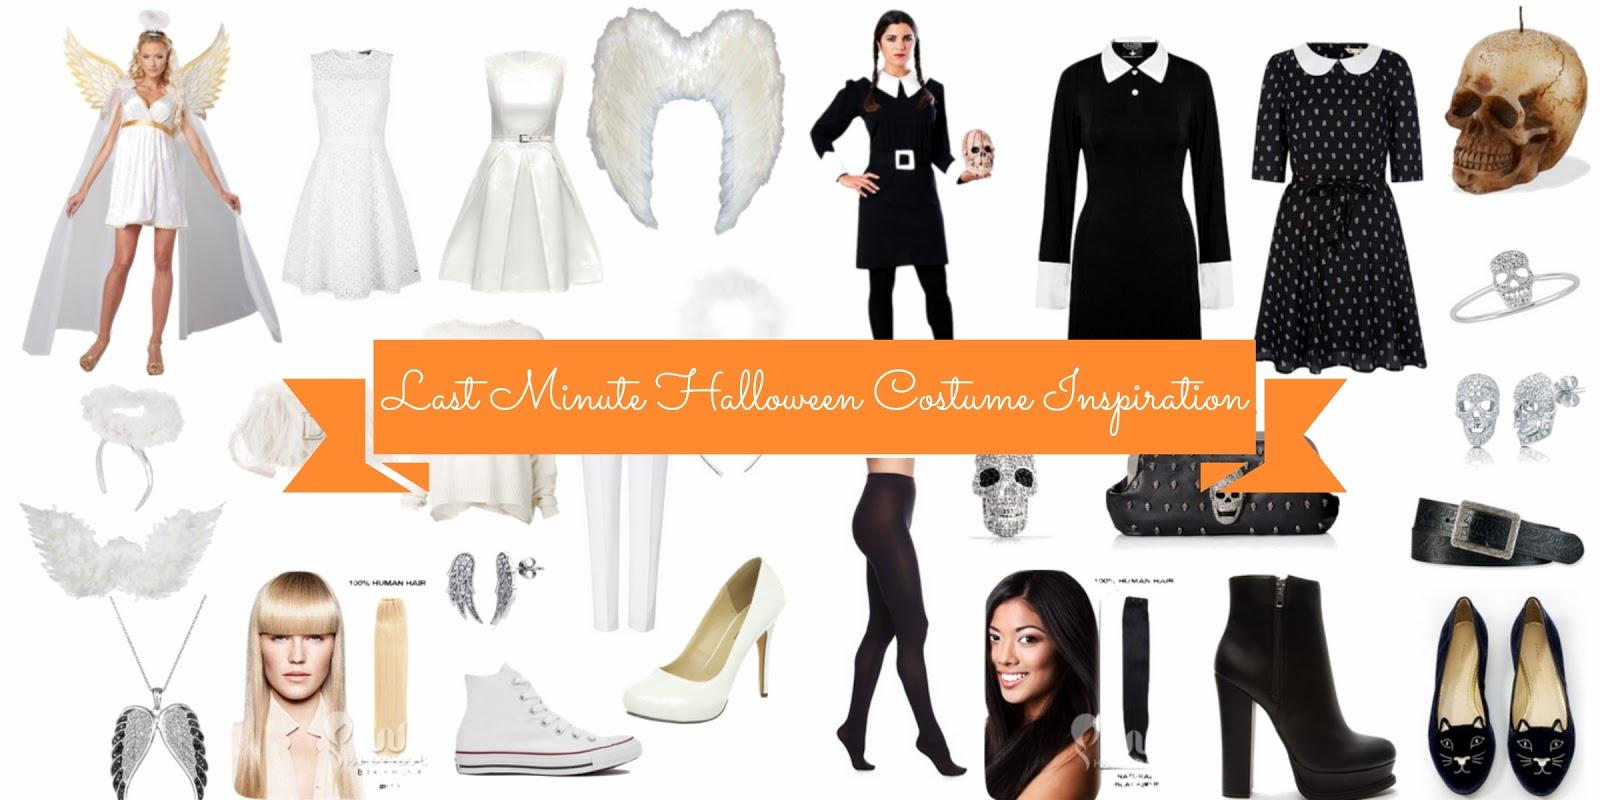 last minute halloween costume inspiration fashion fairytale. Black Bedroom Furniture Sets. Home Design Ideas